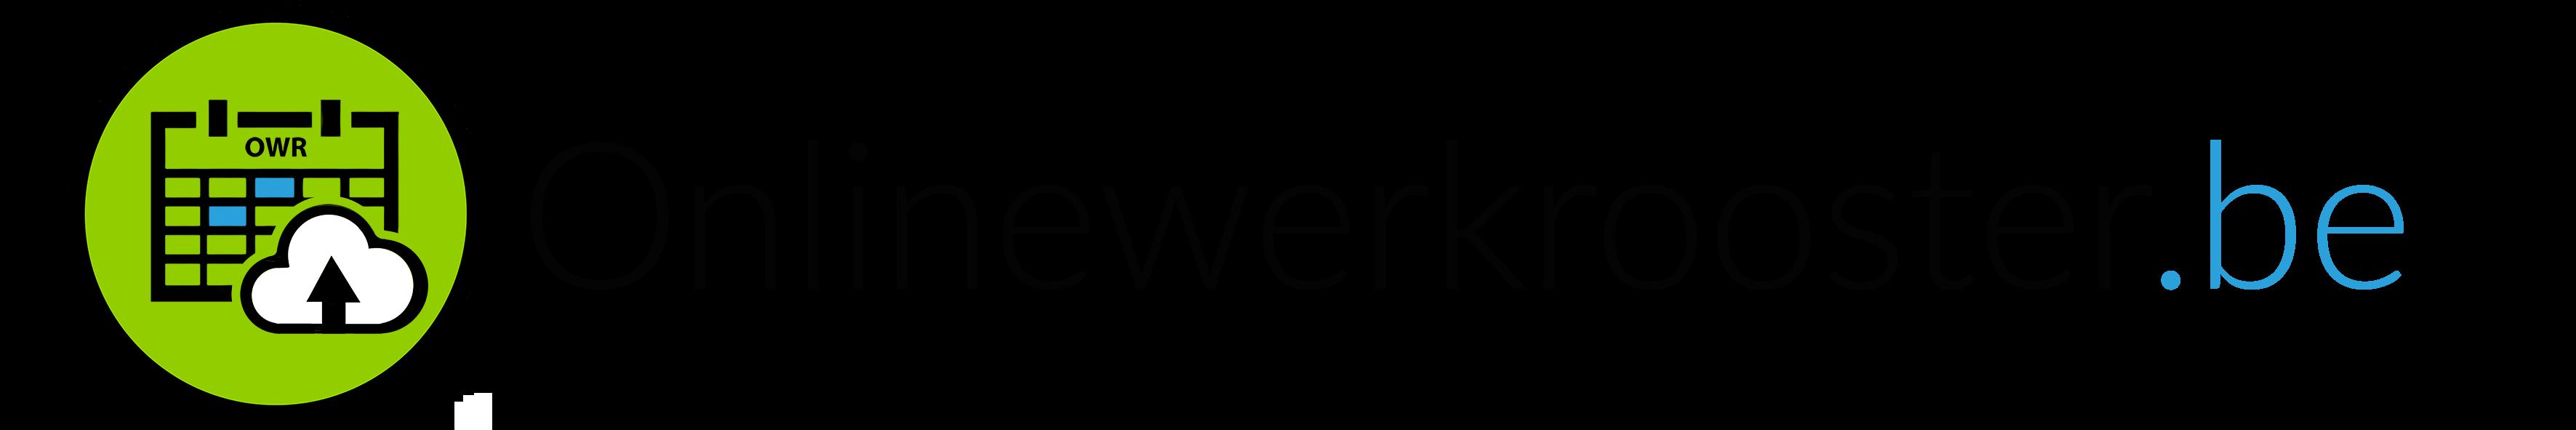 Onlinewerkrooster